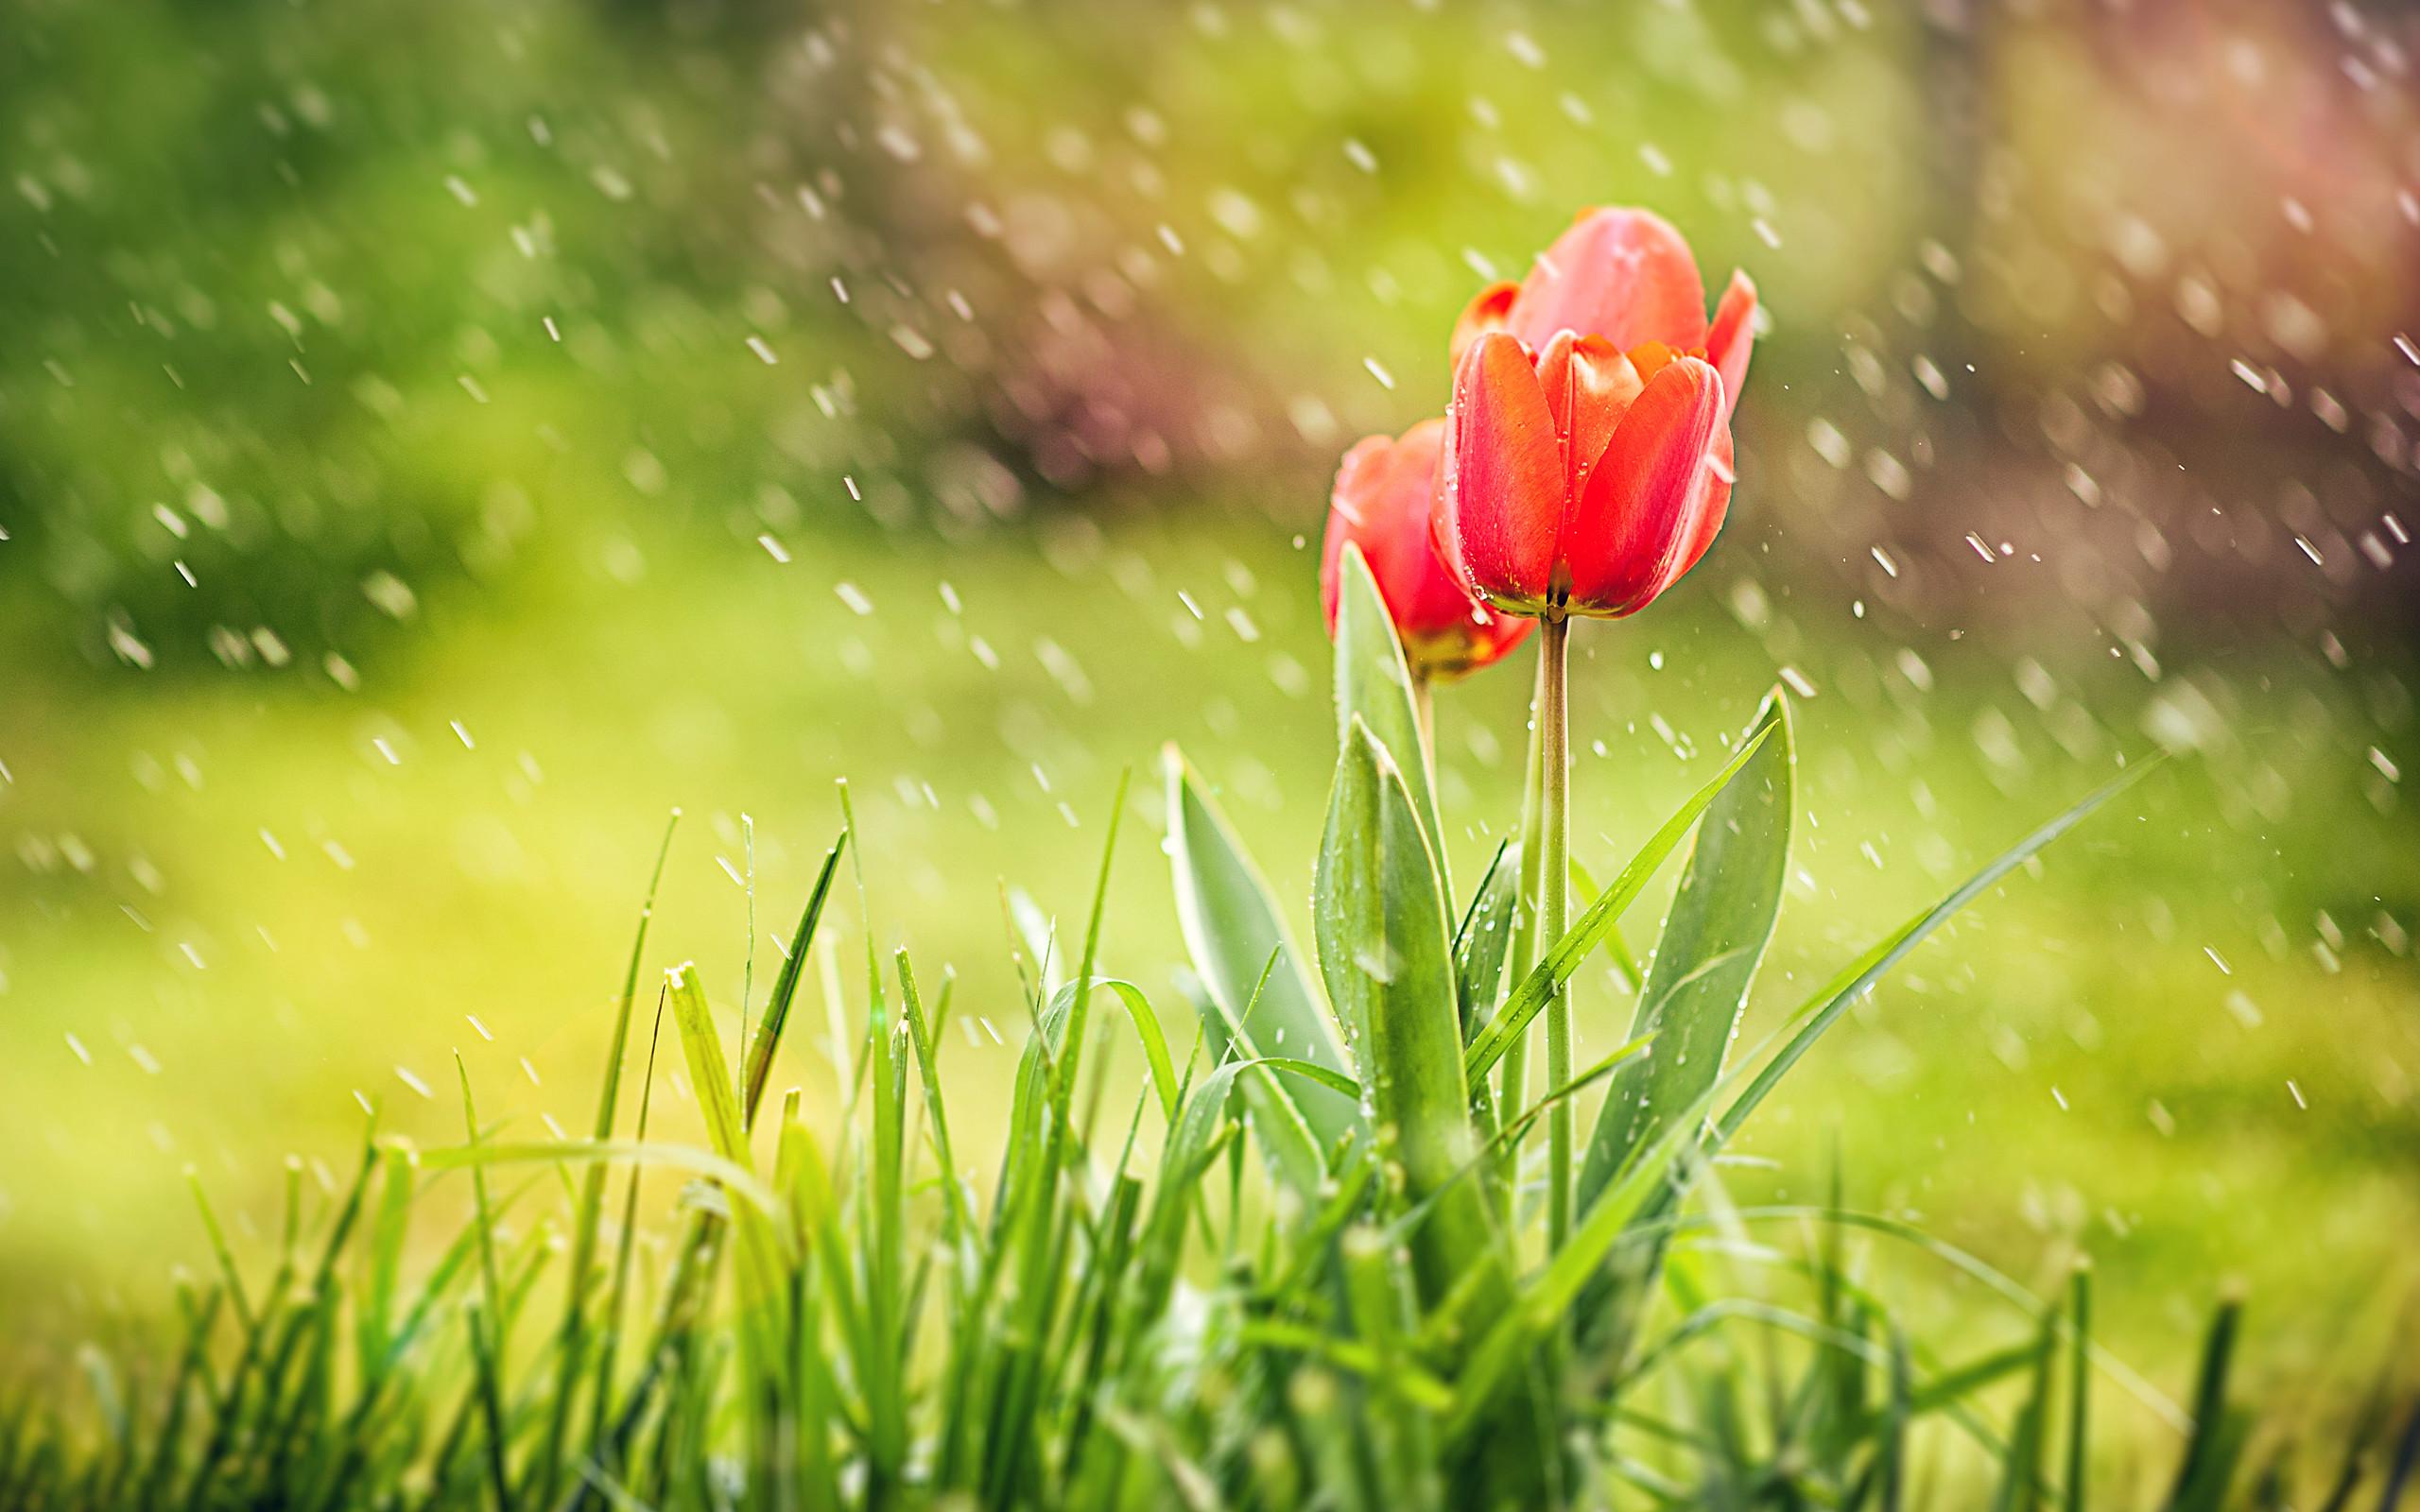 Red Tulip Flowers Wallpaper | red tulip flowers wallpaper 1080p, red tulip flowers  wallpaper desktop, red tulip flowers wallpaper hd, red tulip flo…